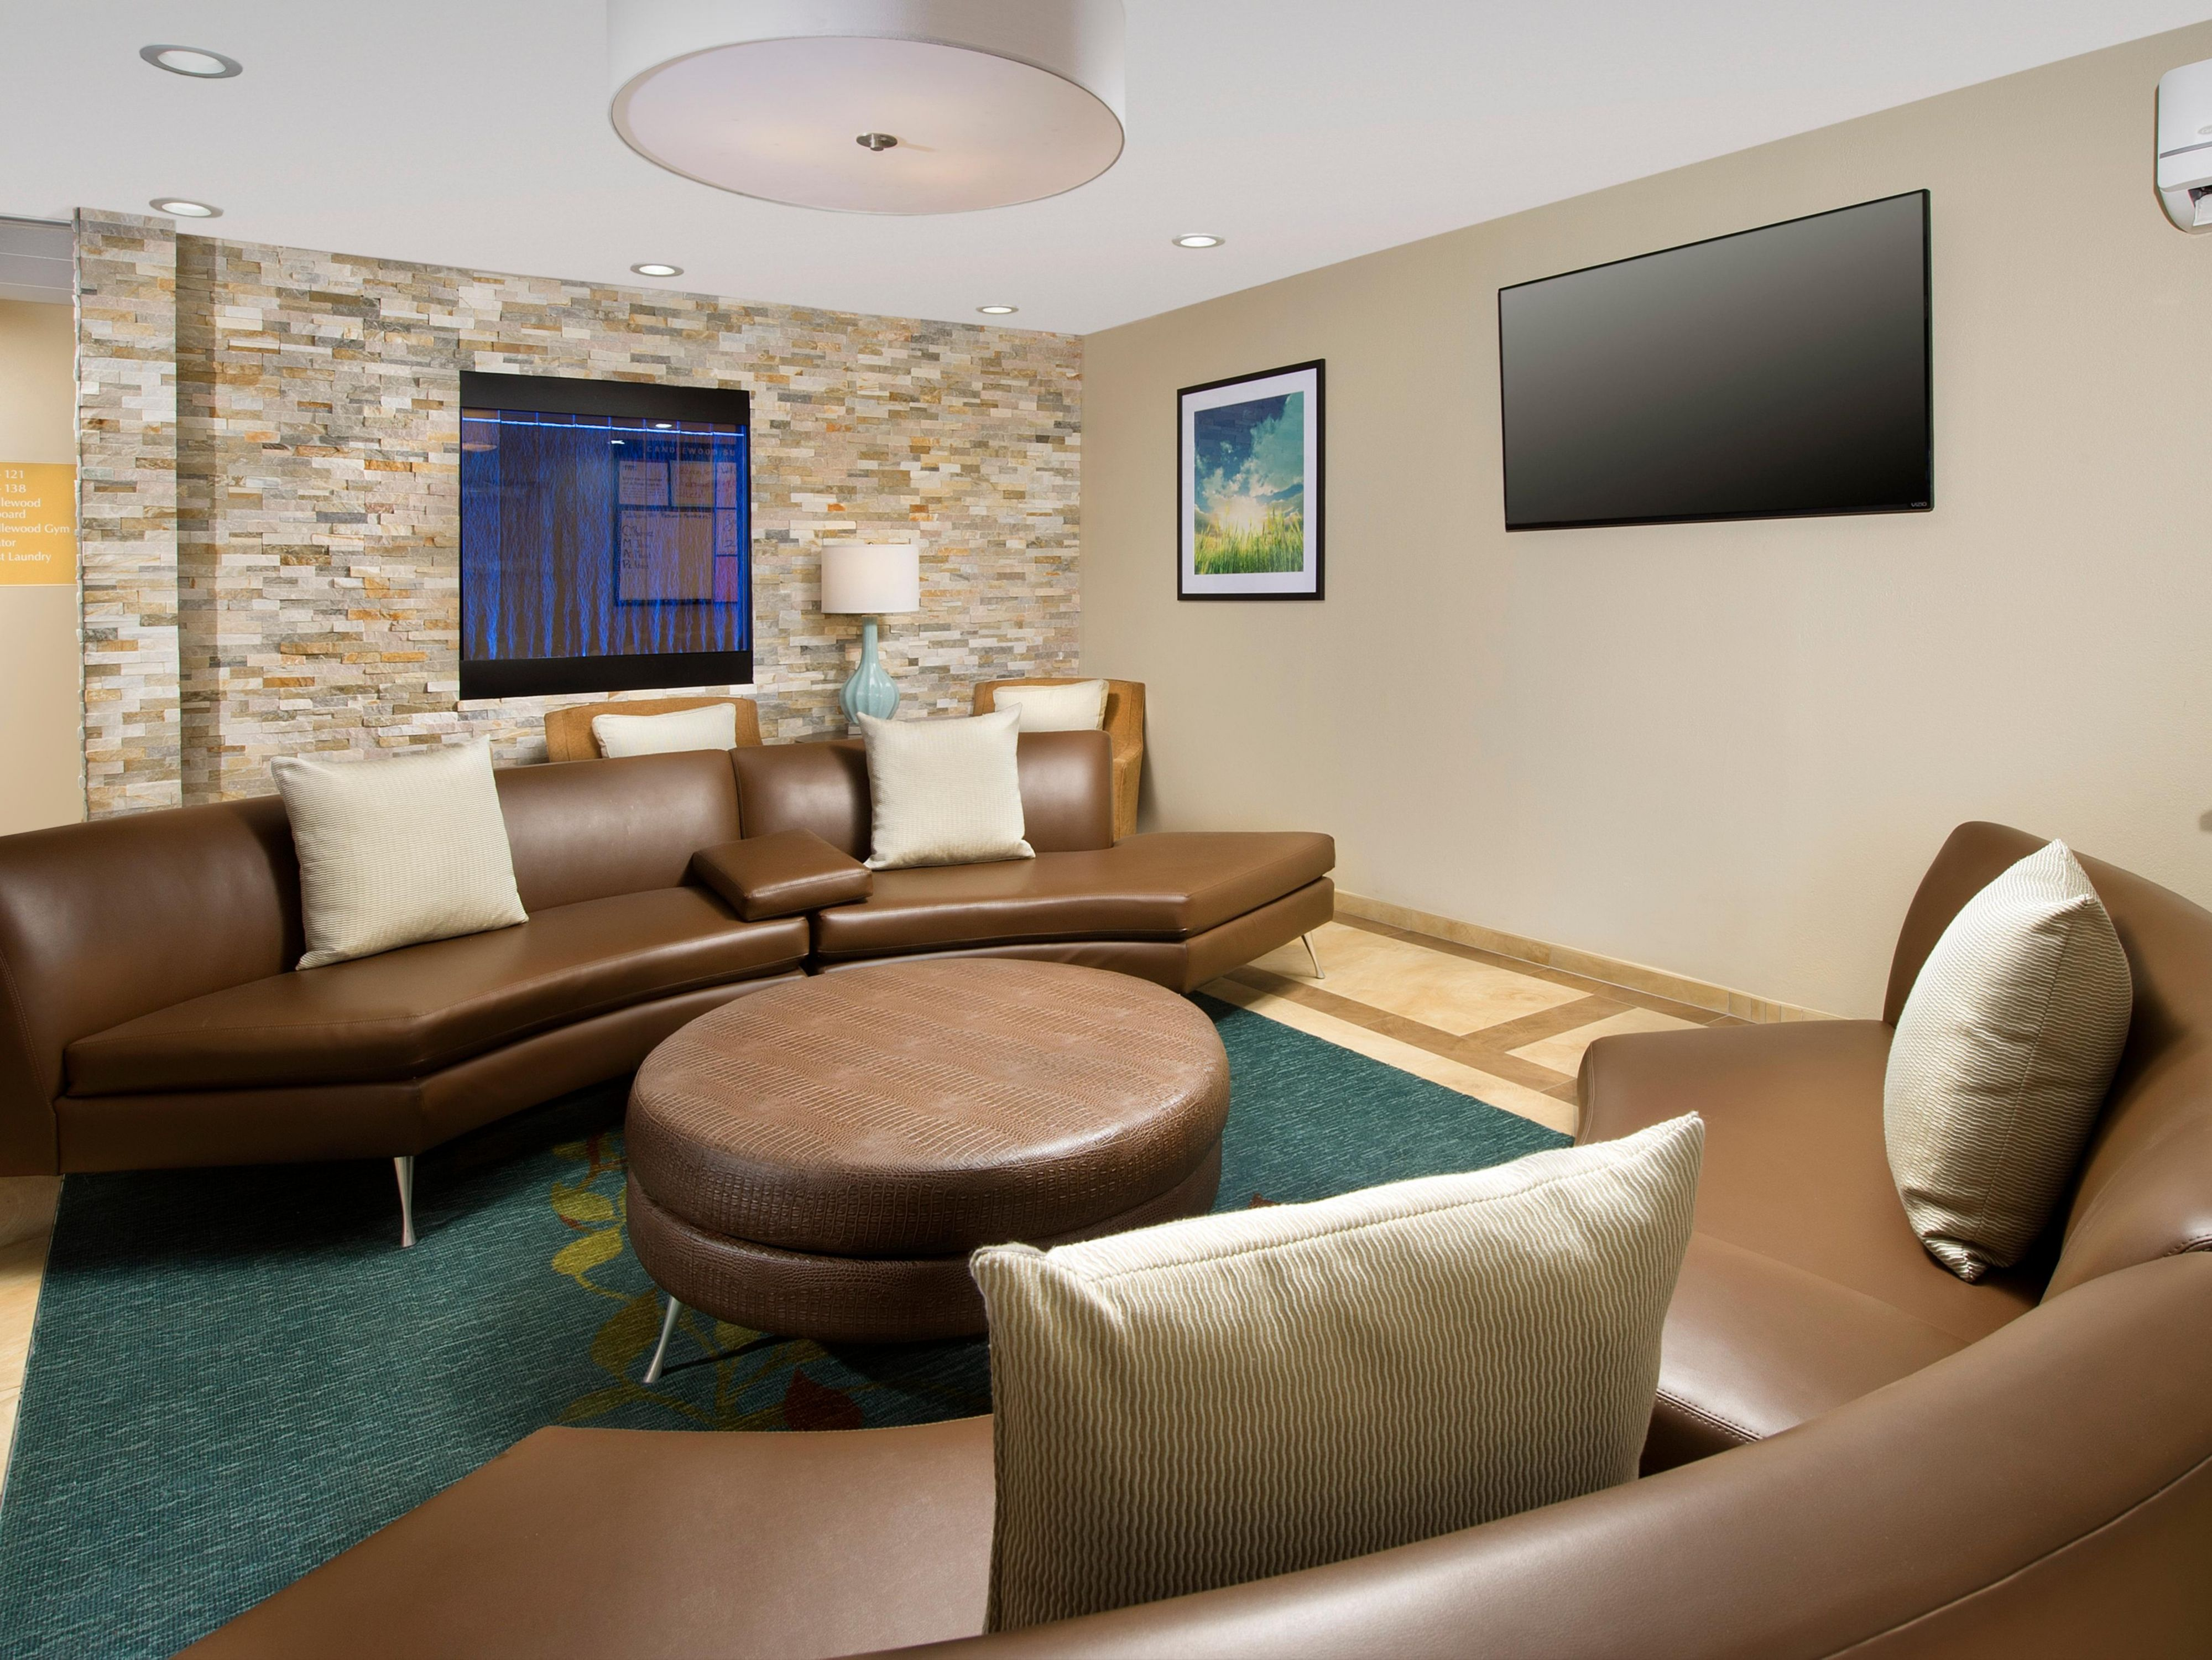 interiors wallpaper va showhouse designed designers jennifer by richmond tag barden interior decorating s stoner